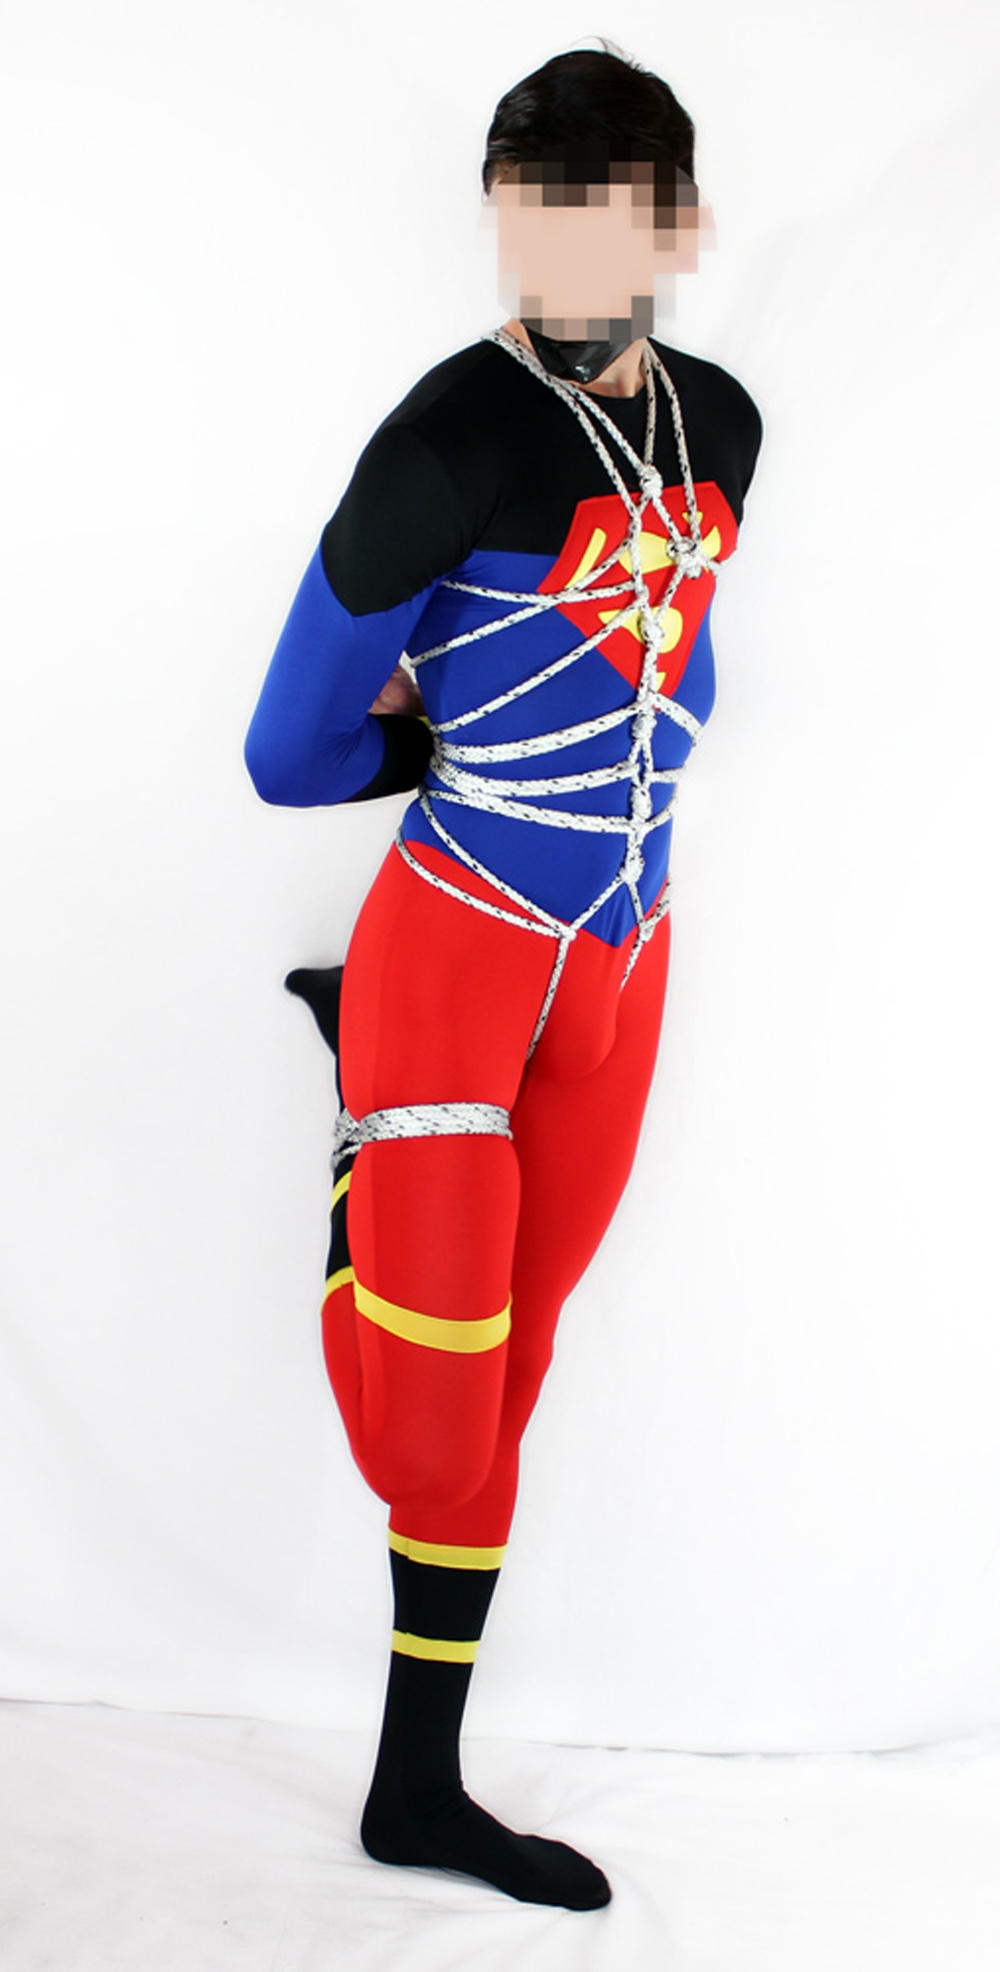 Superboy_06.jpg